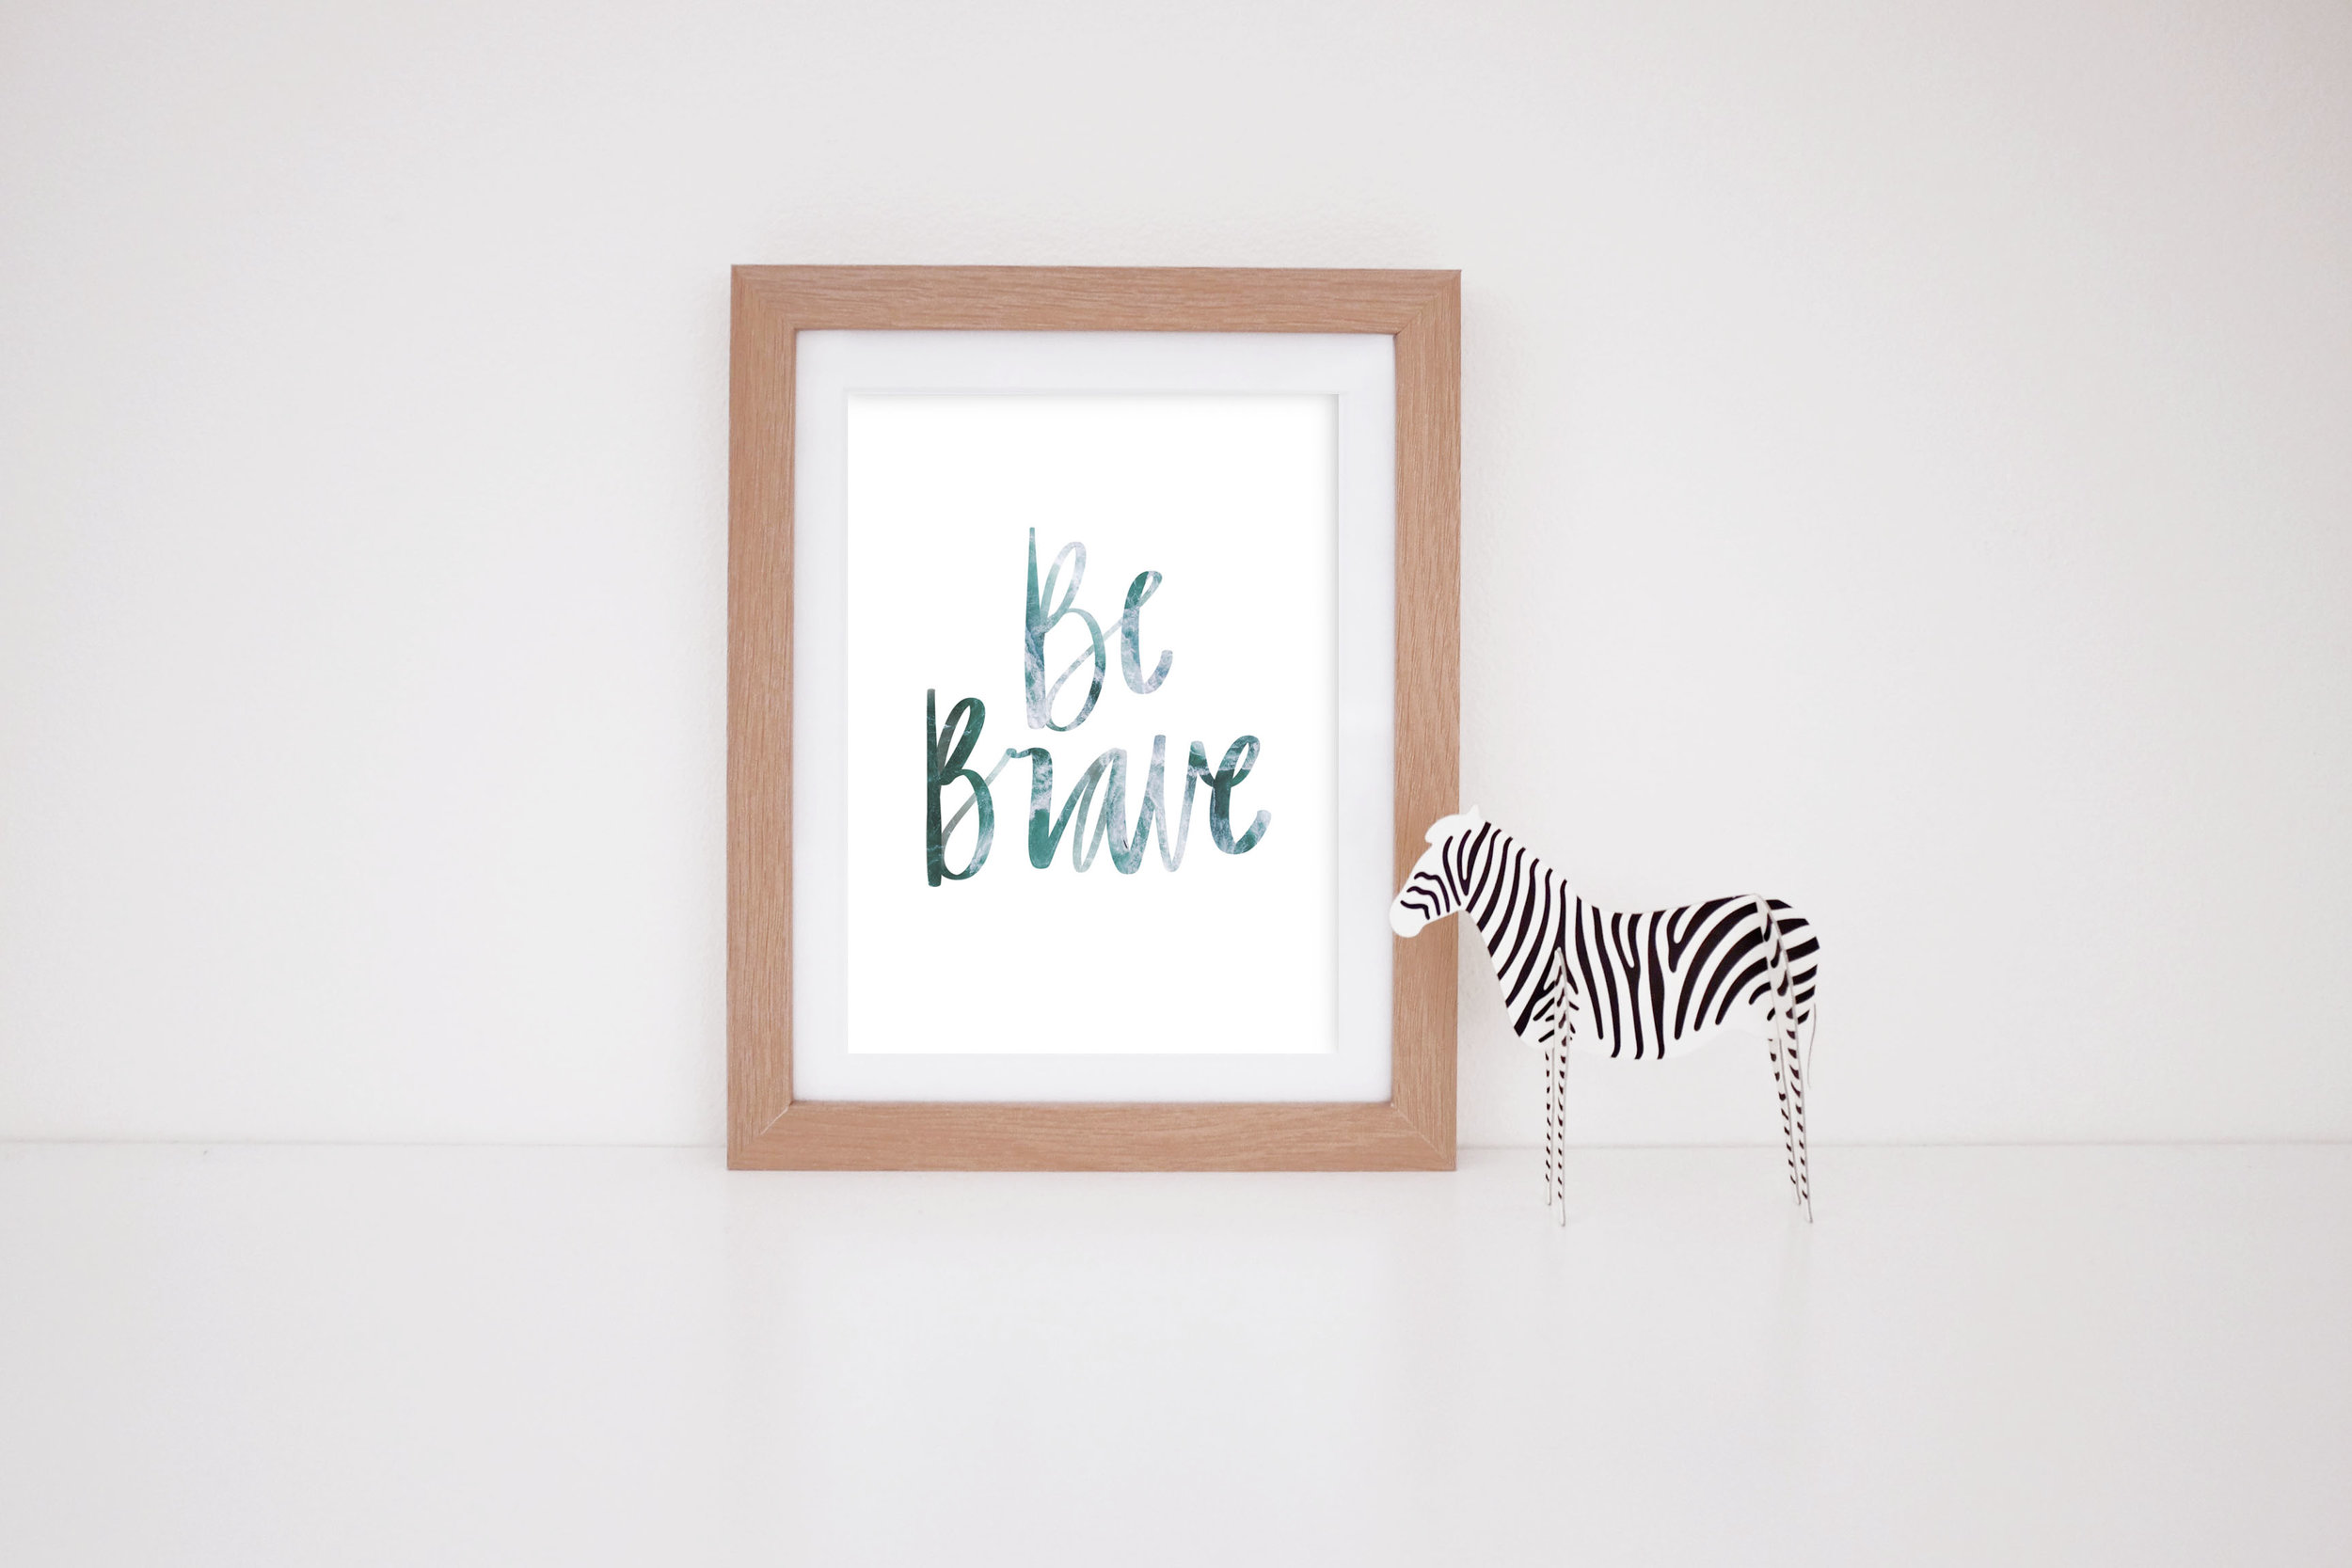 MaryRizzaCruzCreative_ArtInFrame_Zebra_Nursery_Procreate_BeBrave-Colour_2016.jpg